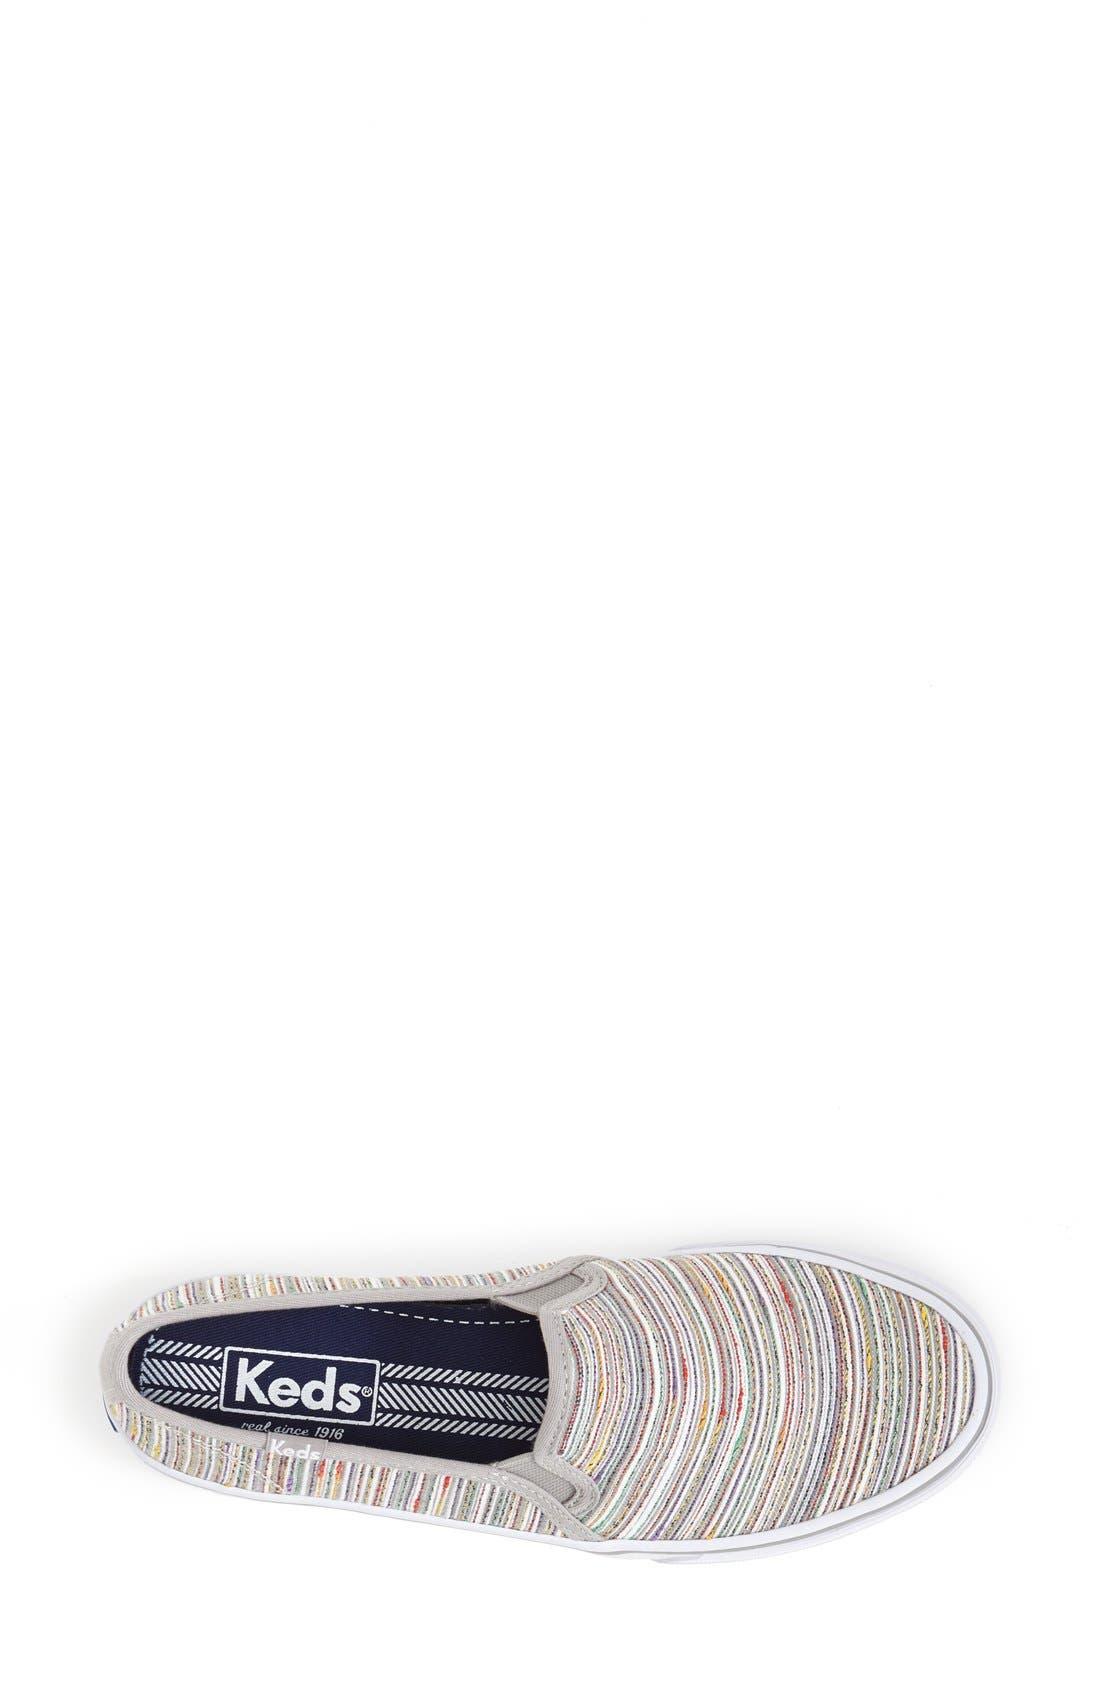 Alternate Image 3  - Keds® 'Double Decker - Woven Stripe' Slip-On Sneaker (Women)